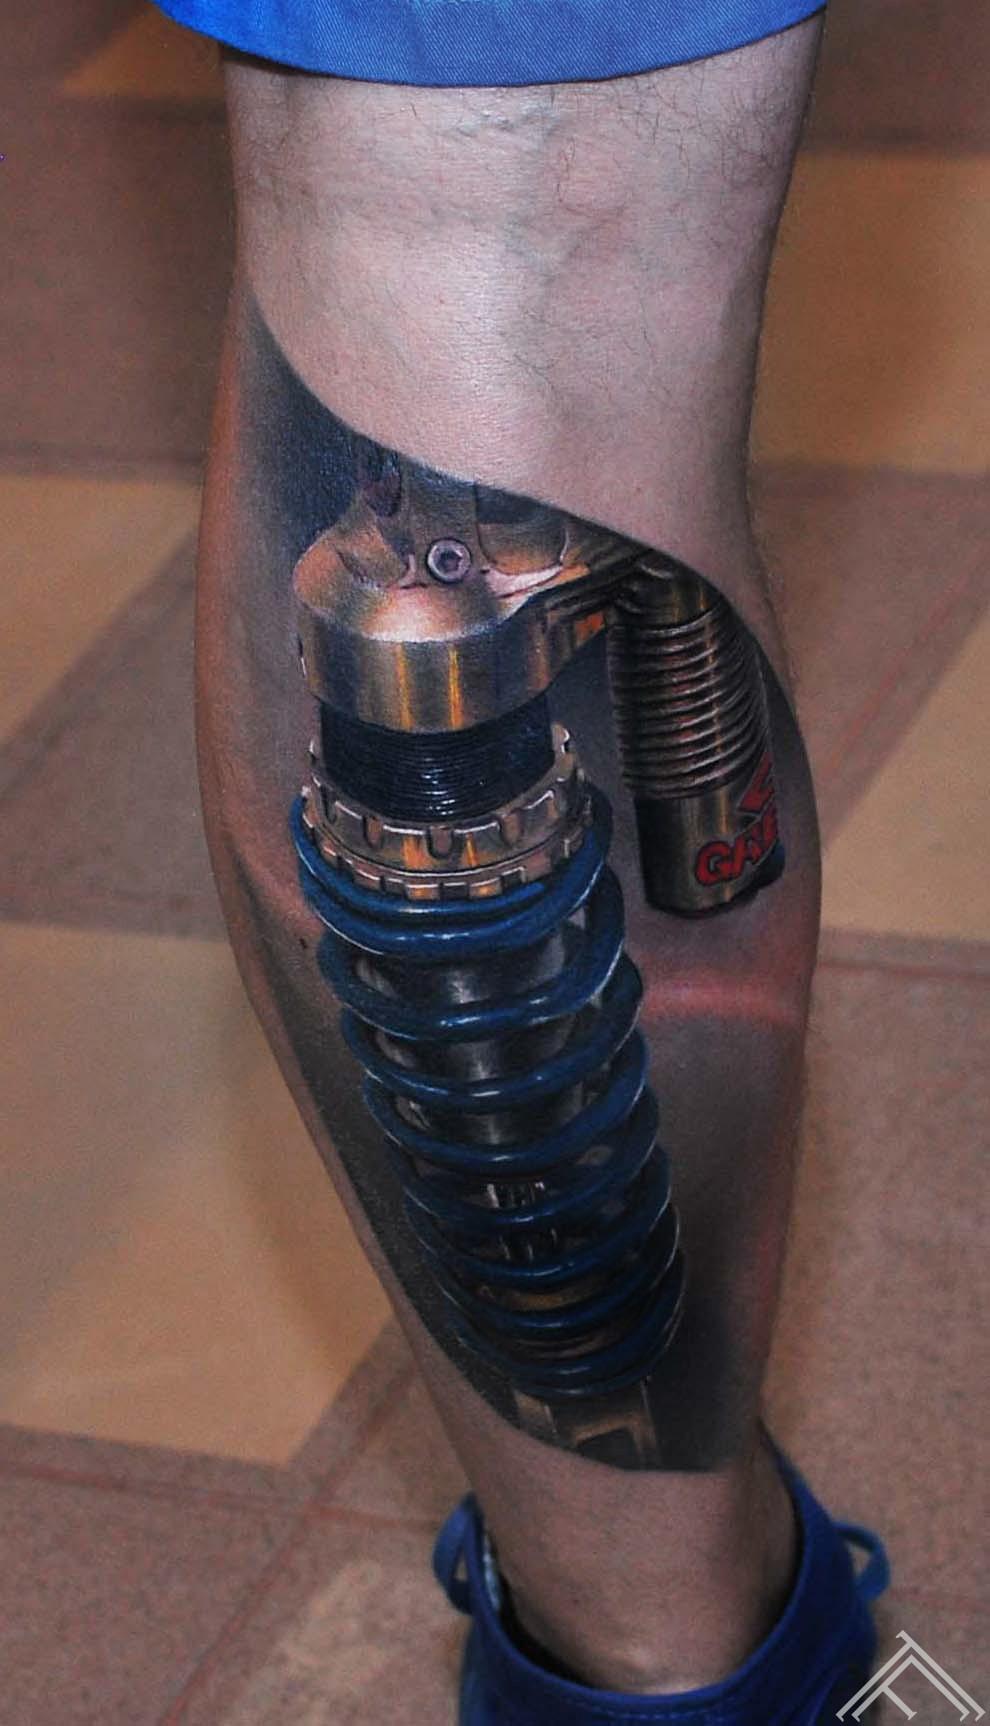 dashpot_tattoo_marispavlo_tattoofrequency_riga_tfth